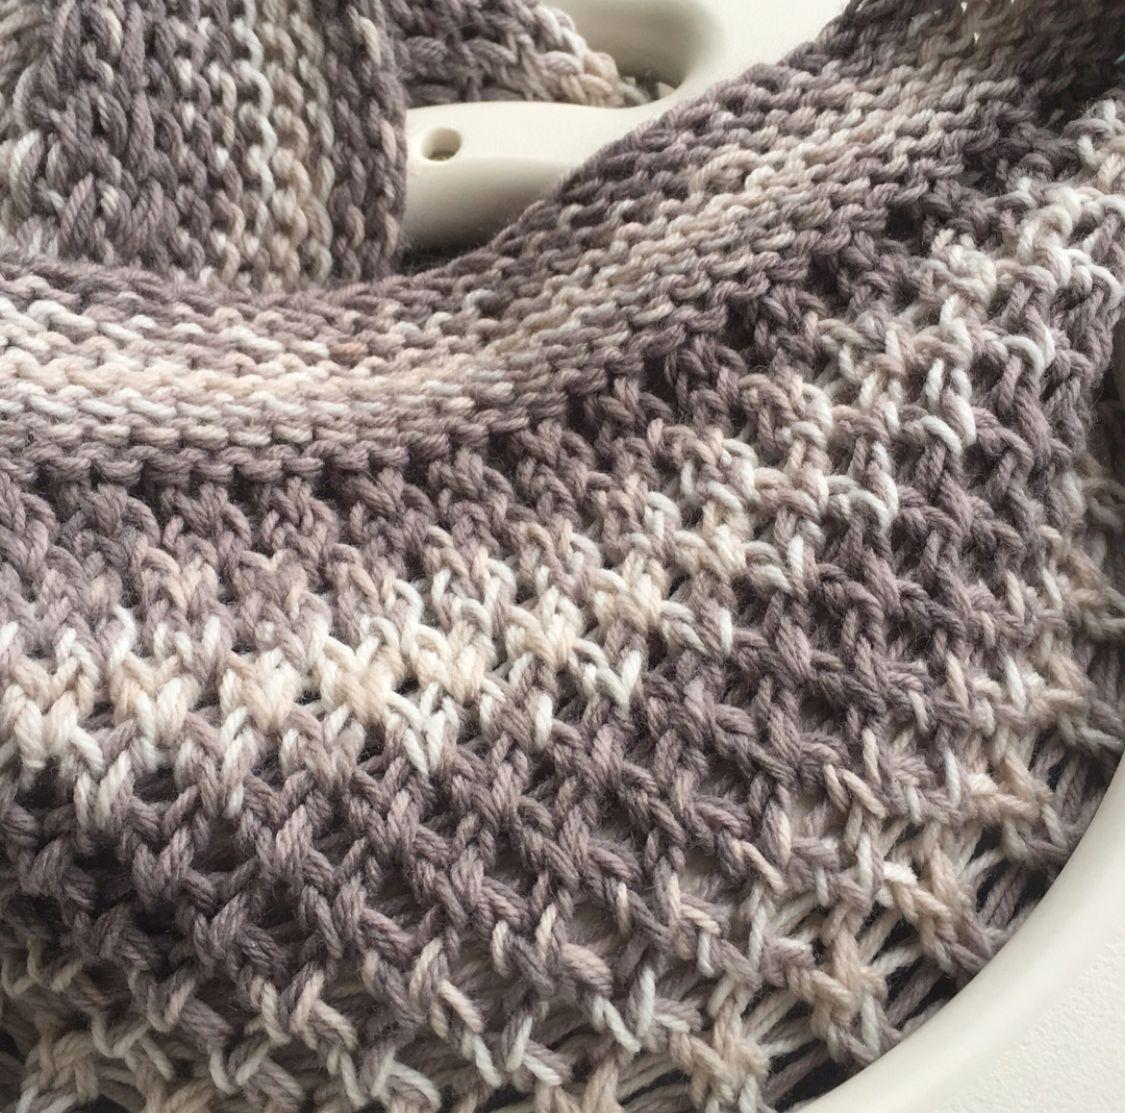 Loom Knit Baby Blanket #loomknitting #loomknitblanket ...